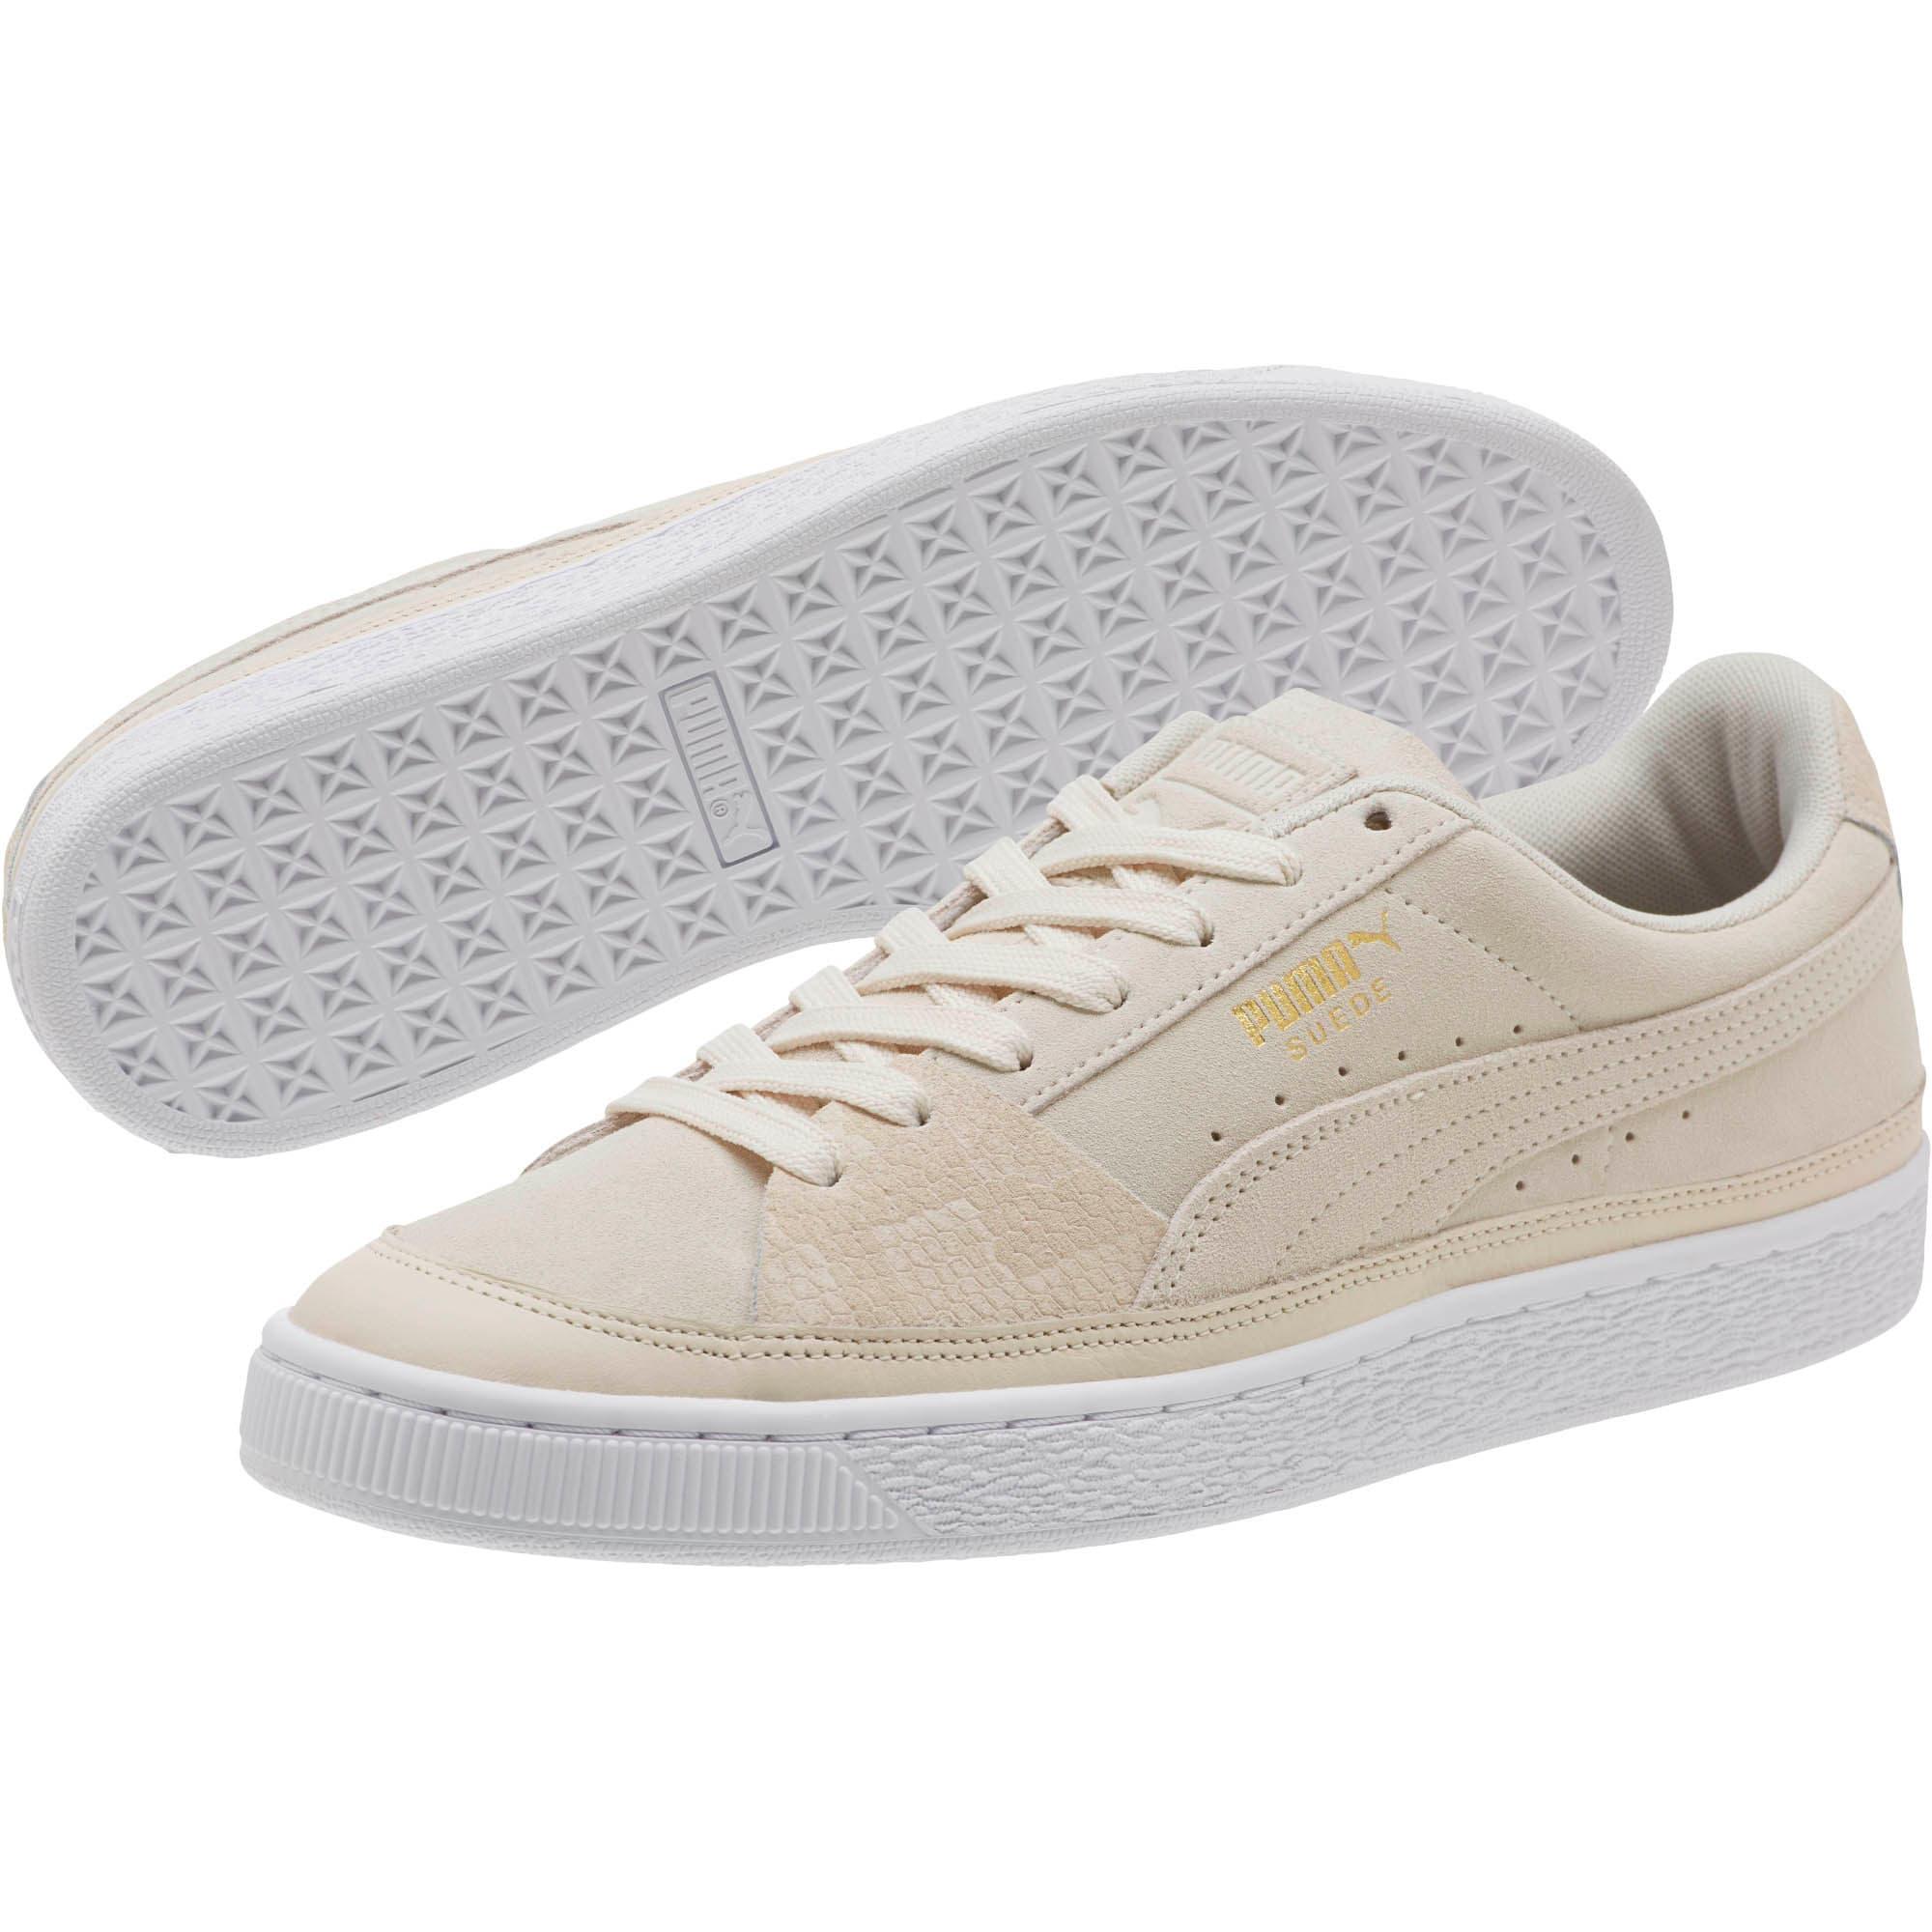 Thumbnail 2 of Suede Skate Premium Sneakers, Whisper White-Puma White, medium